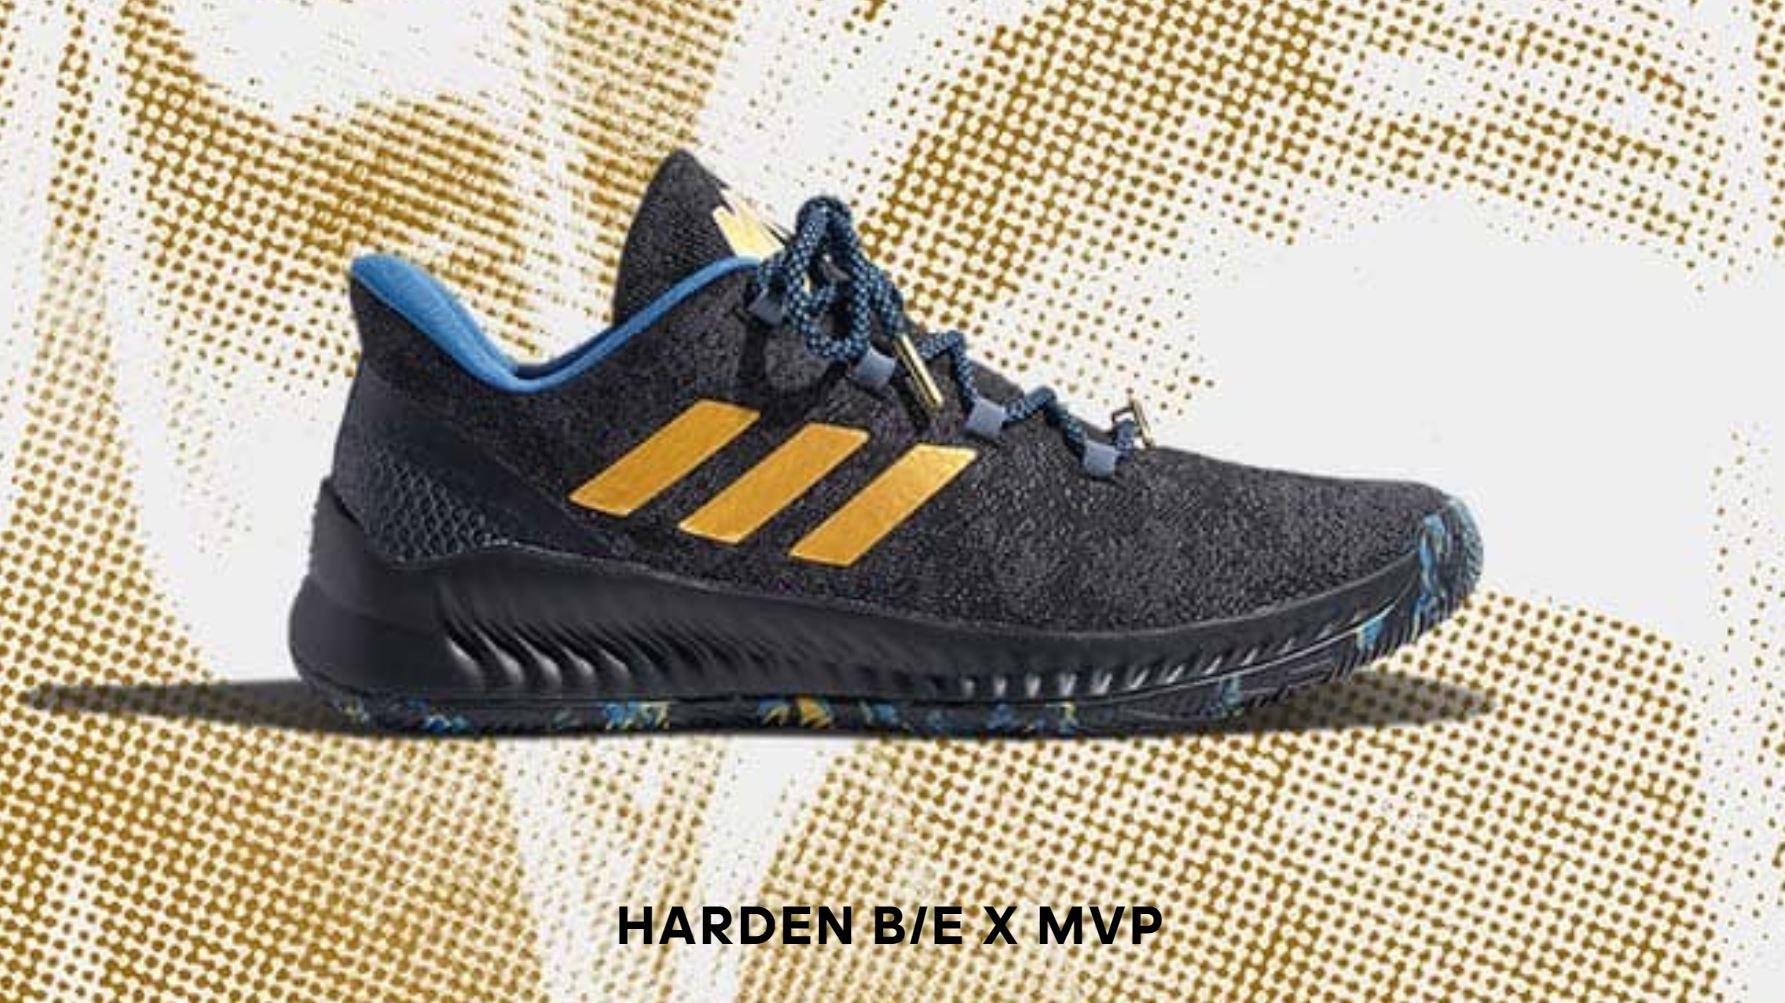 buy popular 40d4f 0e38d czech adidas harden vol 1 black gold b3232 d0b04  coupon code james harden  mvp harden be 2 35725 b20eb